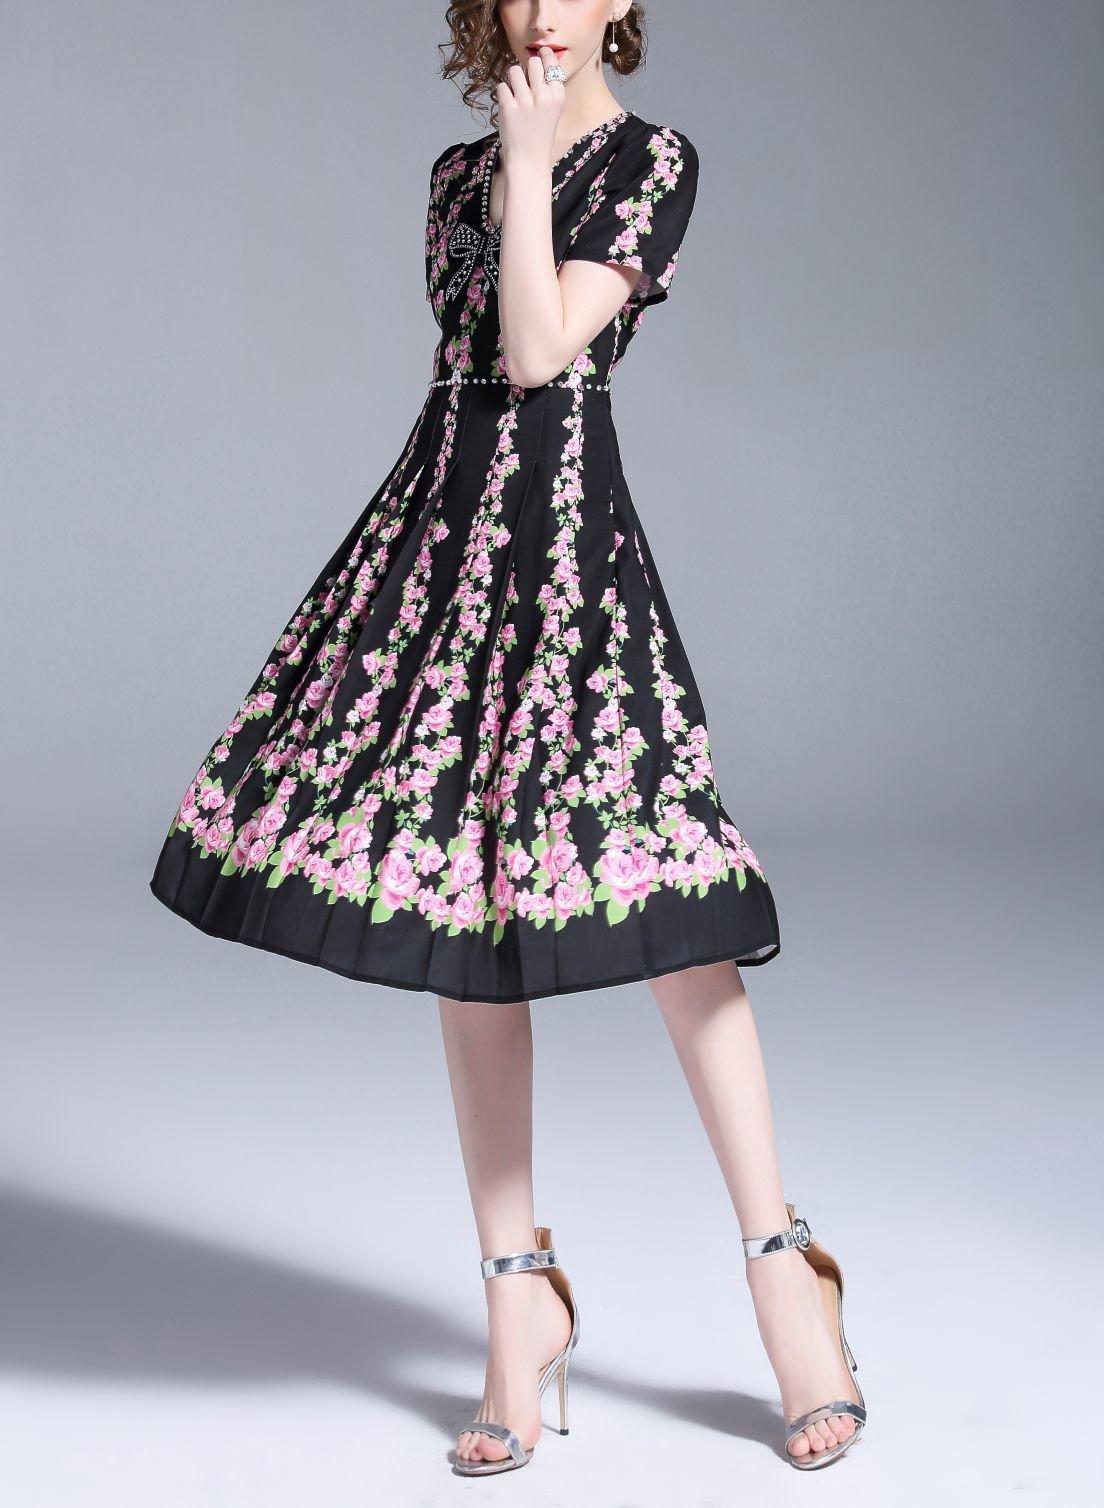 Pretty Pleated Formal Dress with Rhinestones